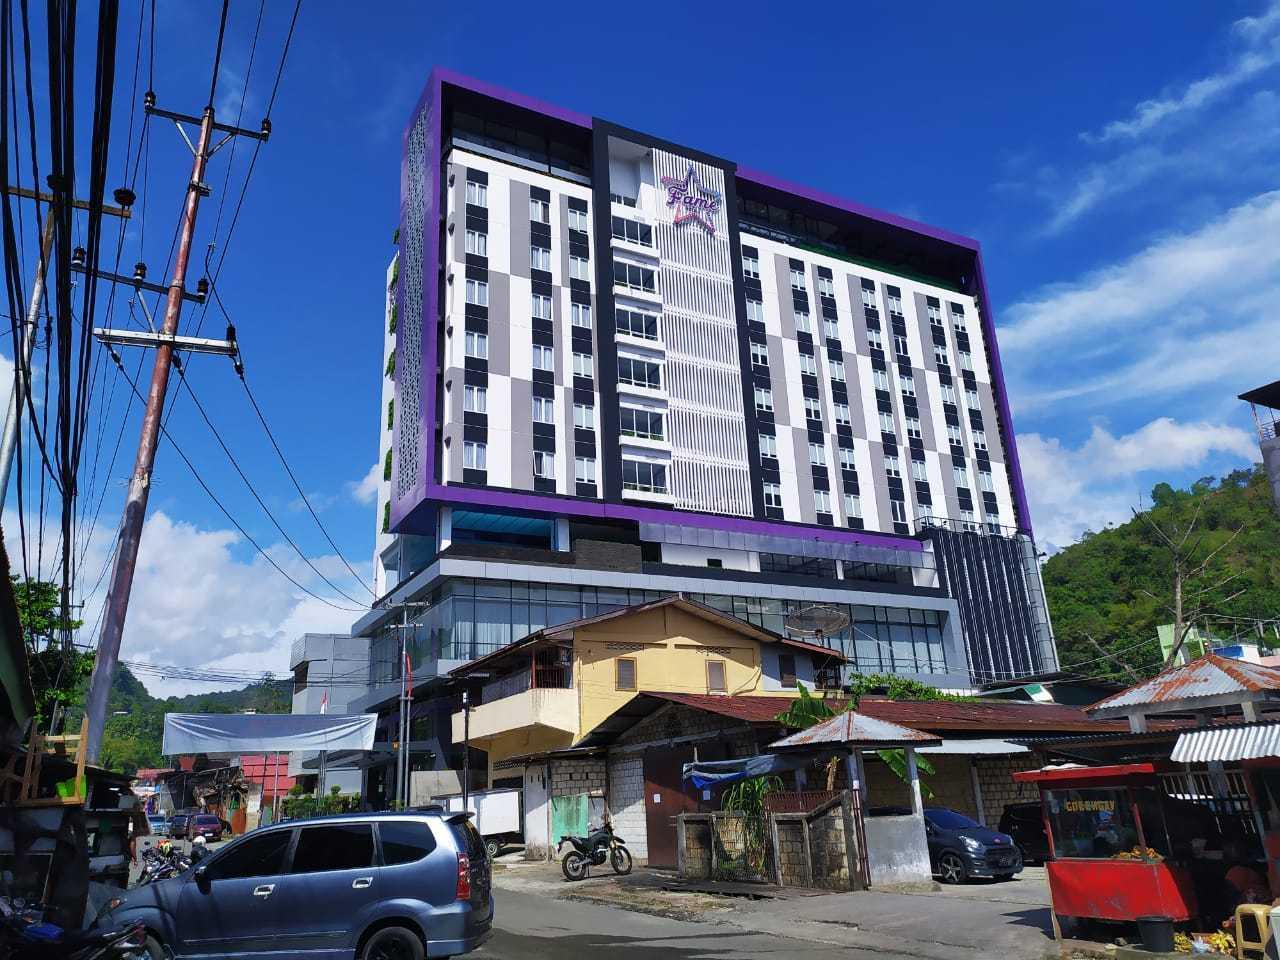 Pt.  Atelier Una Indonesia Fox (Fame) Hotel Jayapura Jayapura, Kota Jayapura, Papua, Indonesia Jayapura, Kota Jayapura, Papua, Indonesia Pt-Atelier-Una-Indonesia-Fame-Hotel-Jayapura   82425